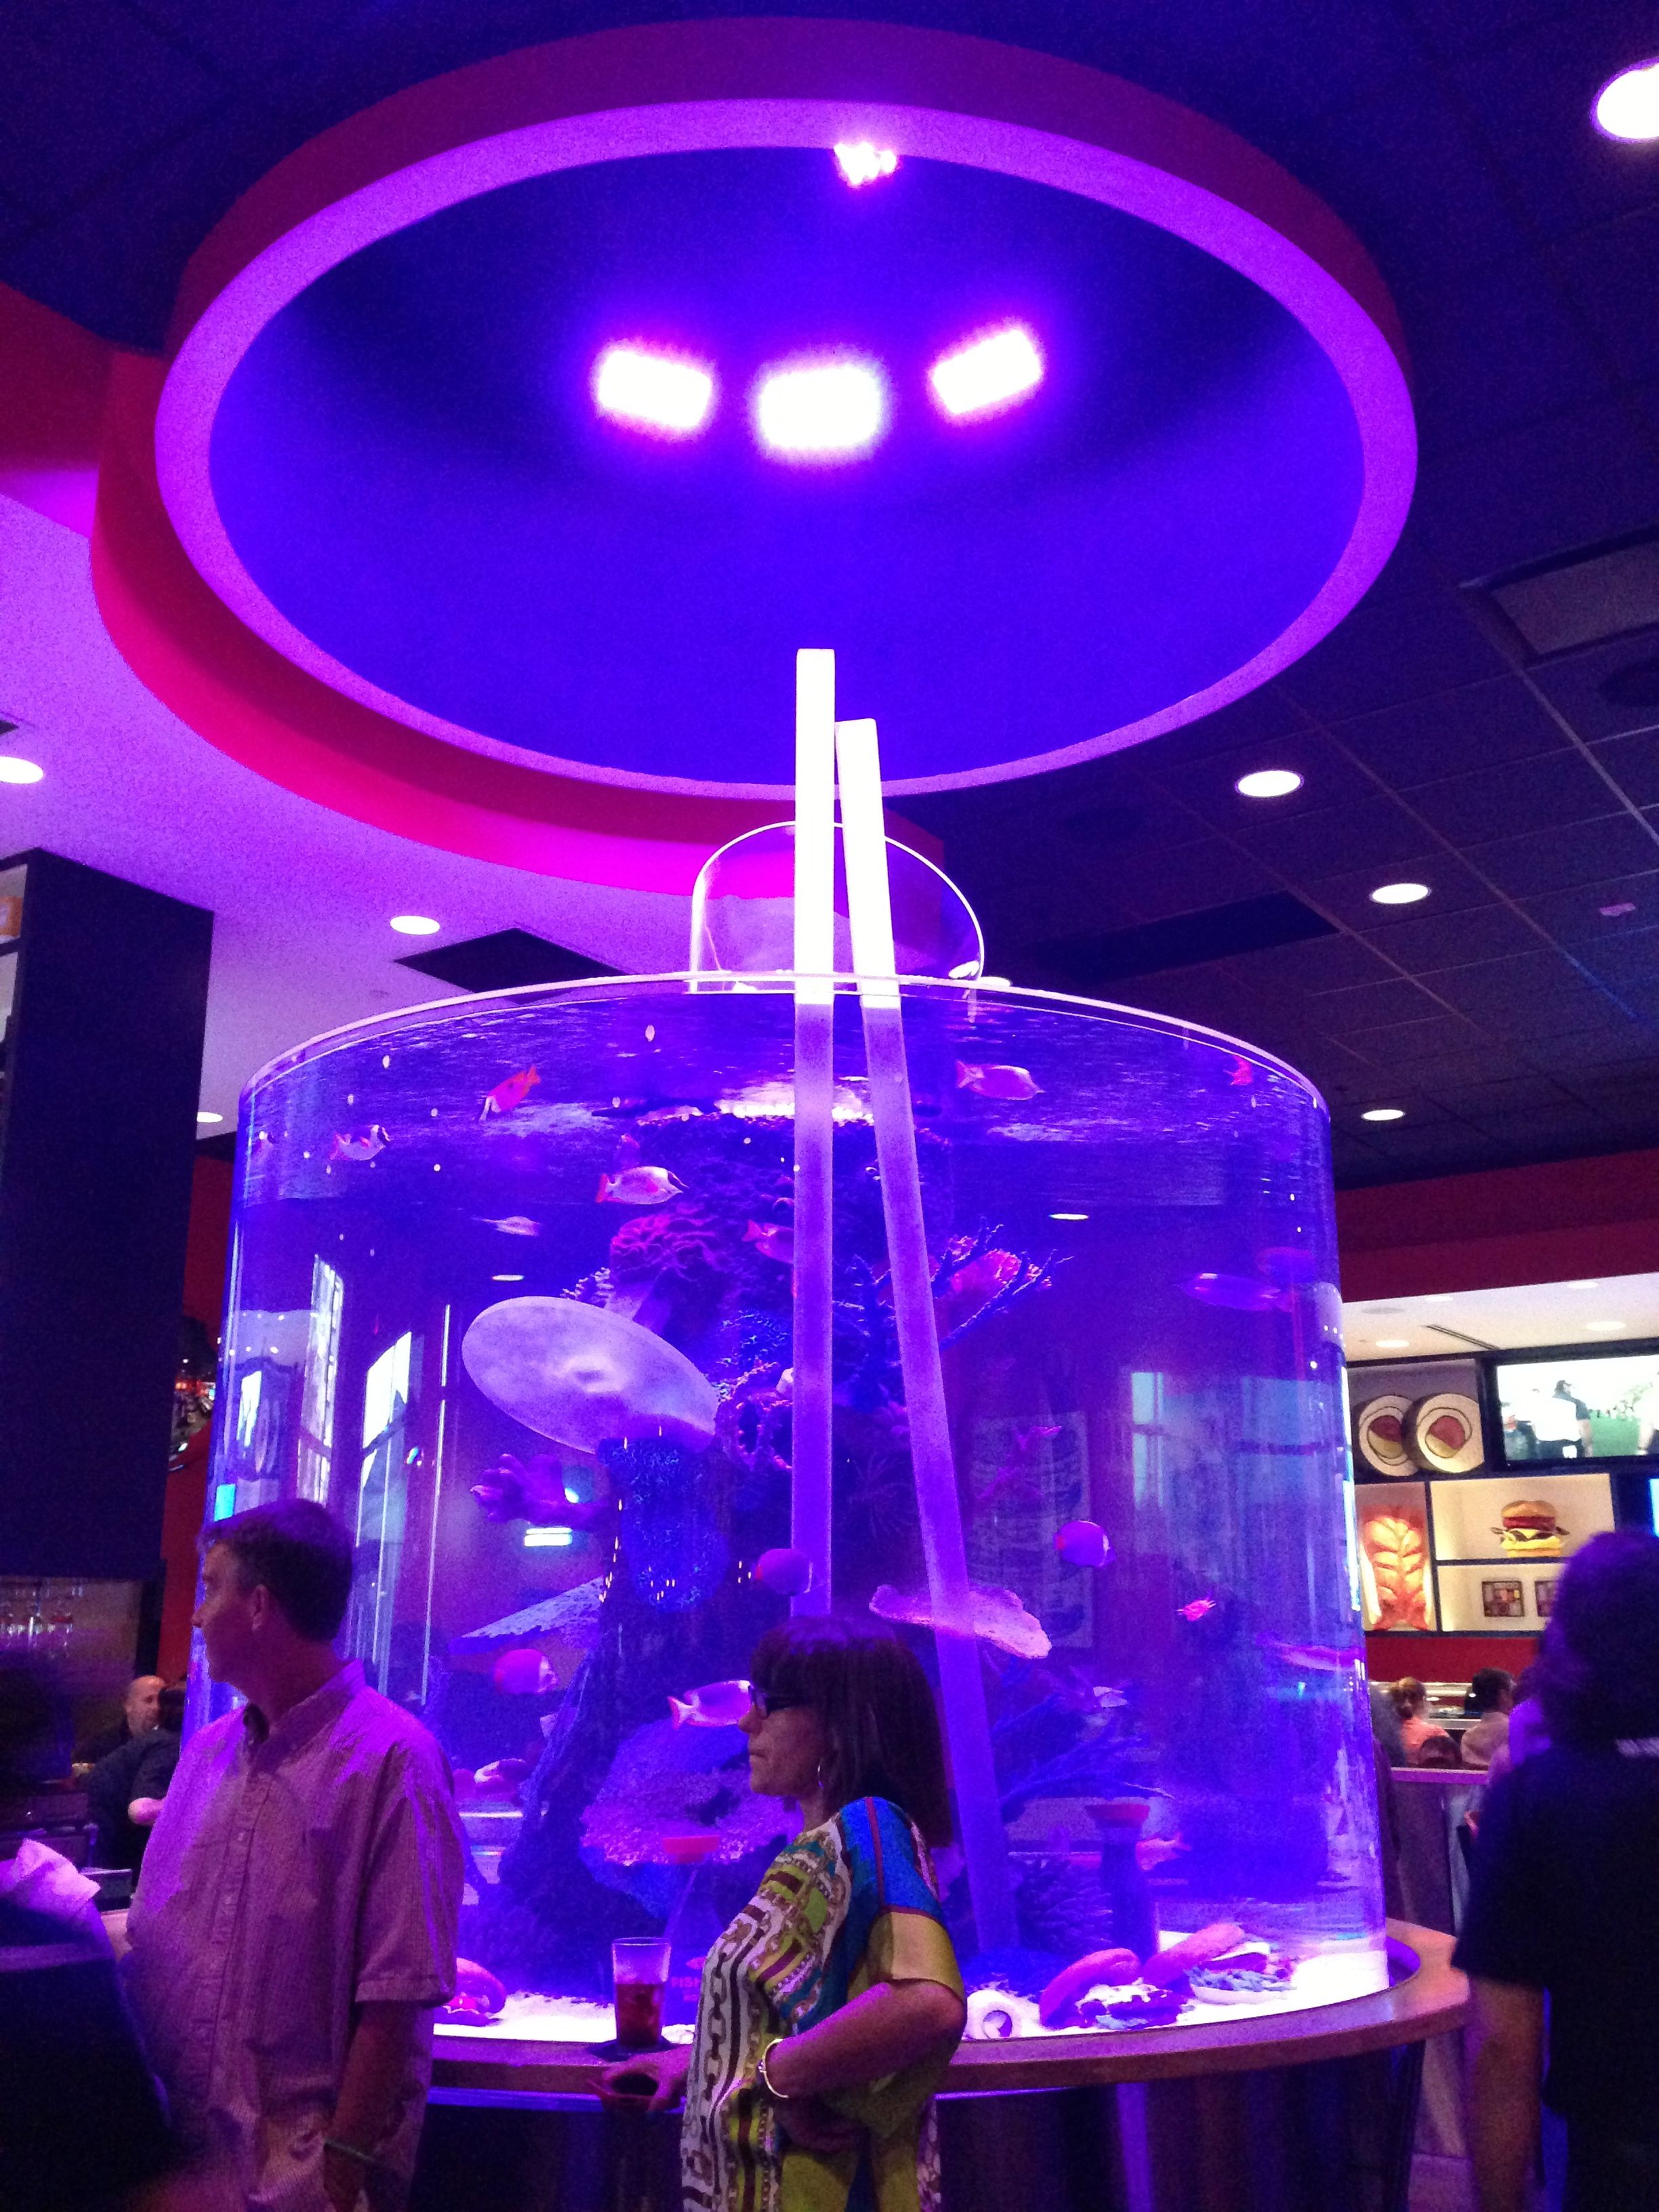 IMG_2290 Raleigh Aquarium fish tank, Fish tank, Cool